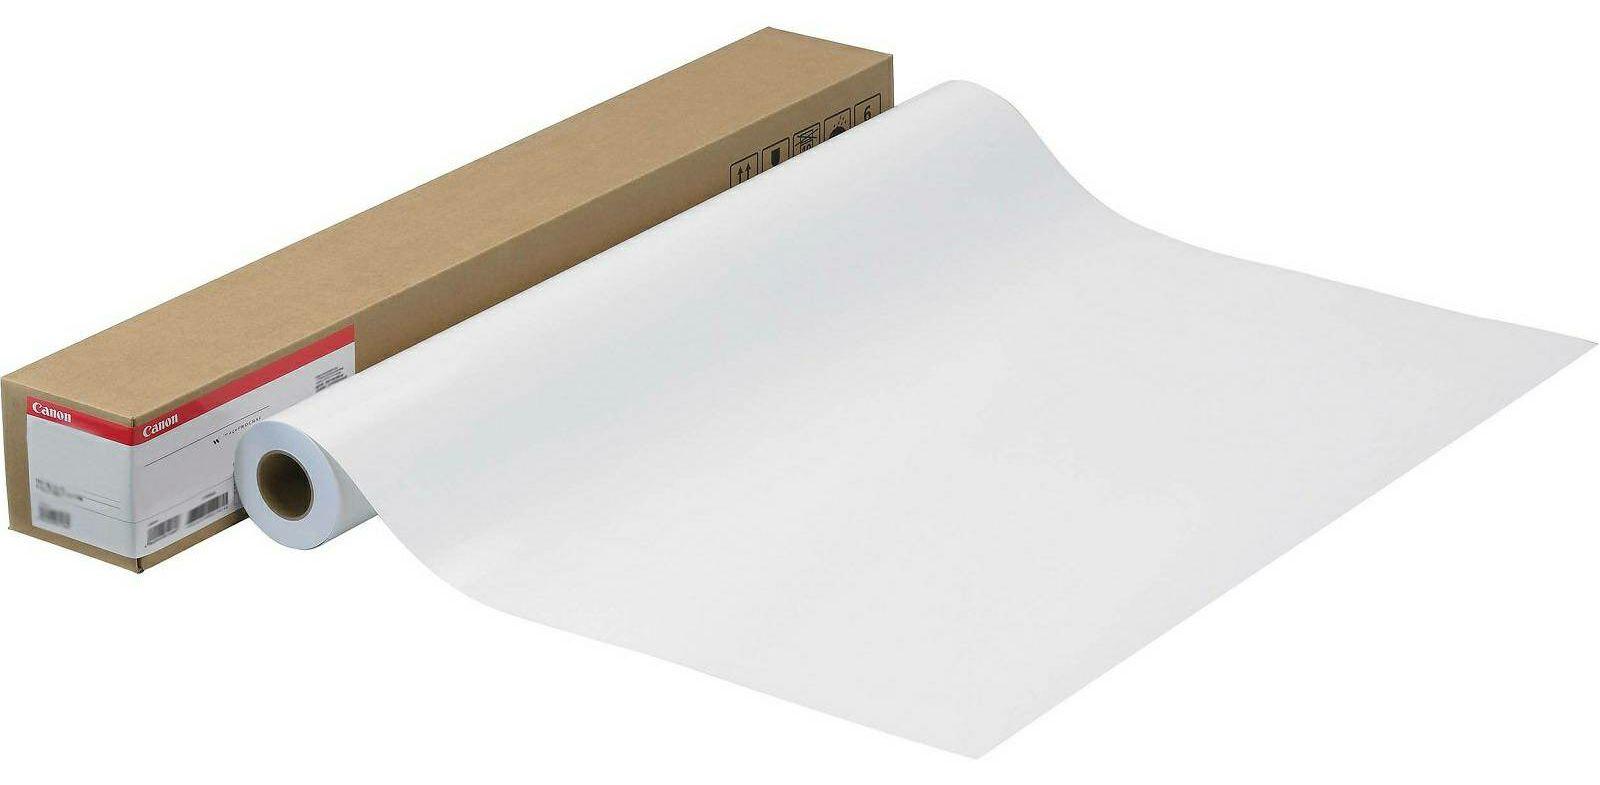 Canon Matt Coated Paper 140gsm 42